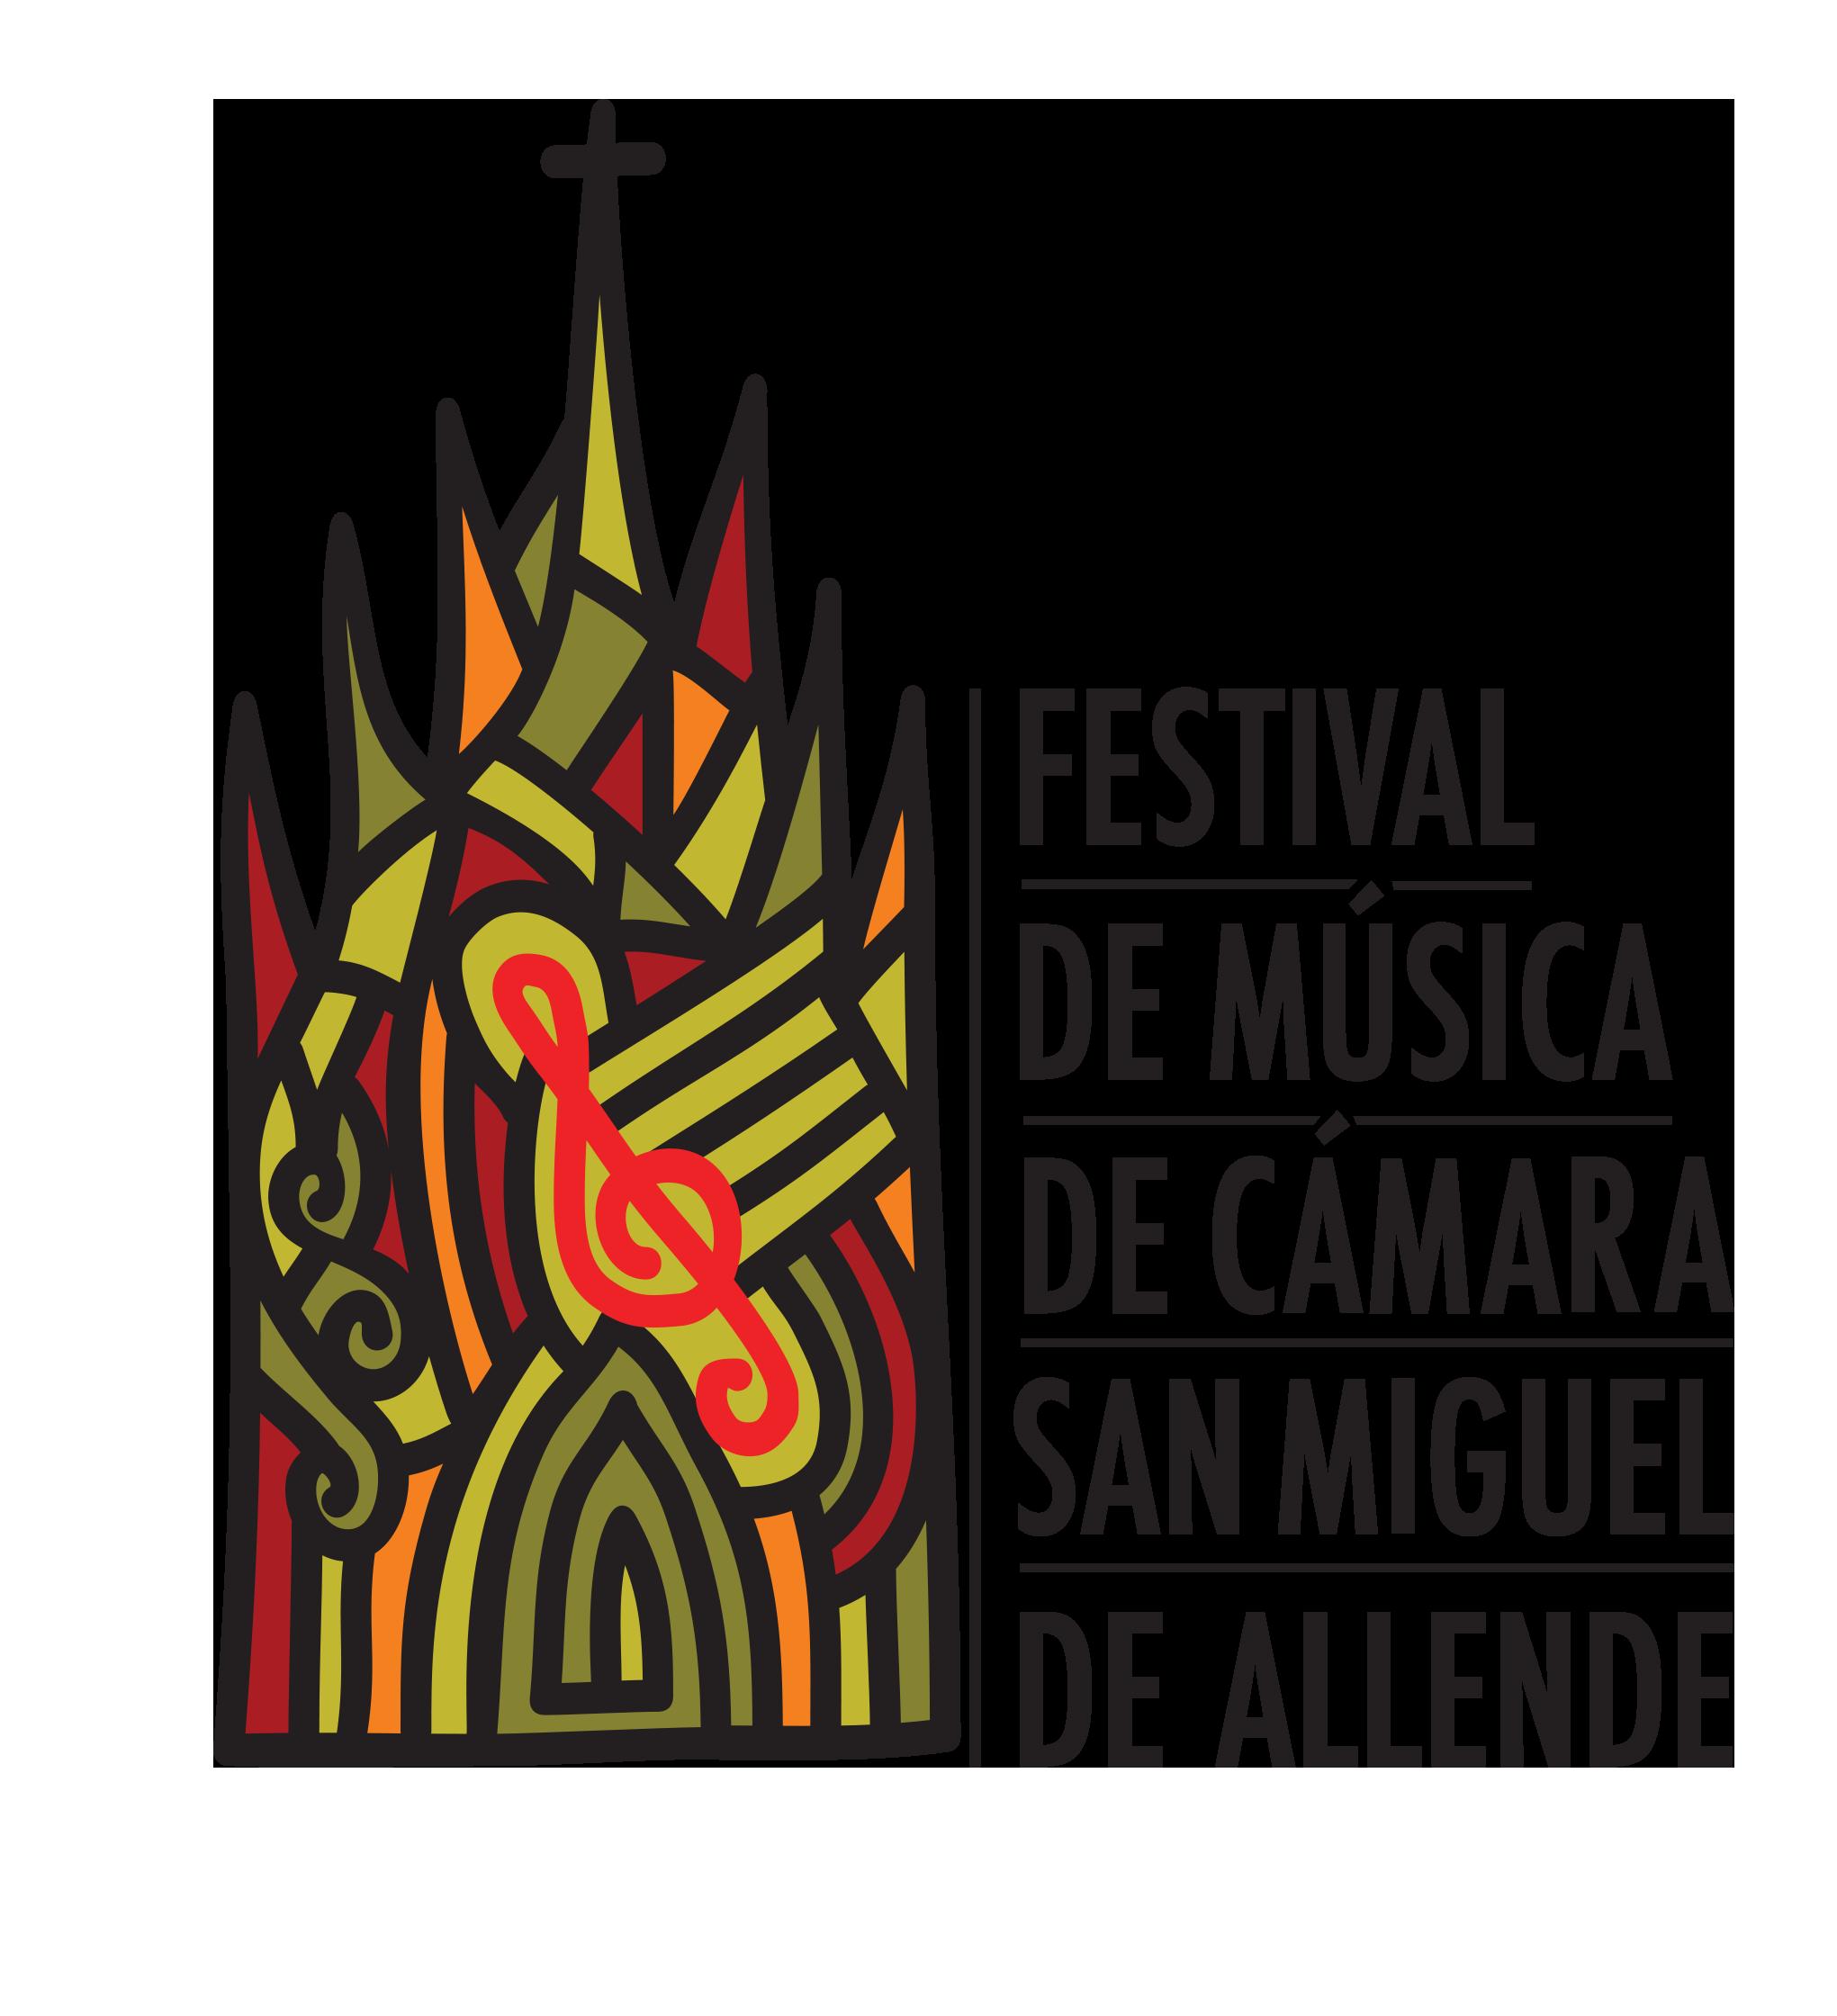 Musician clipart music mexican. Festival de m sica